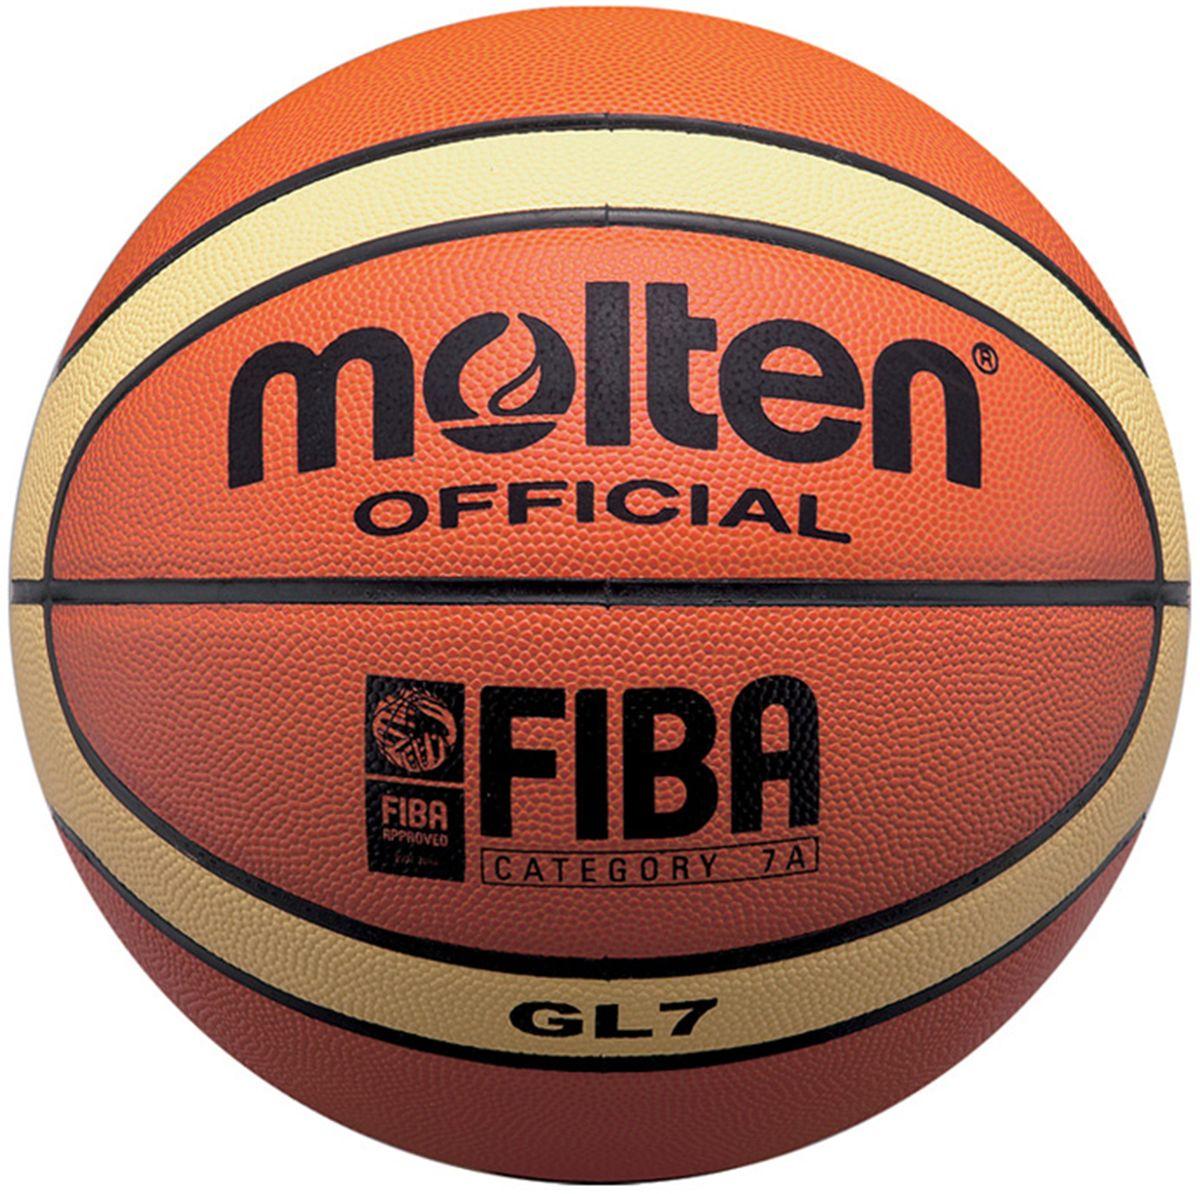 "Molten Мяч баскетбольный Molten ""GL7"", цвет: оранжевый. Размер 7"